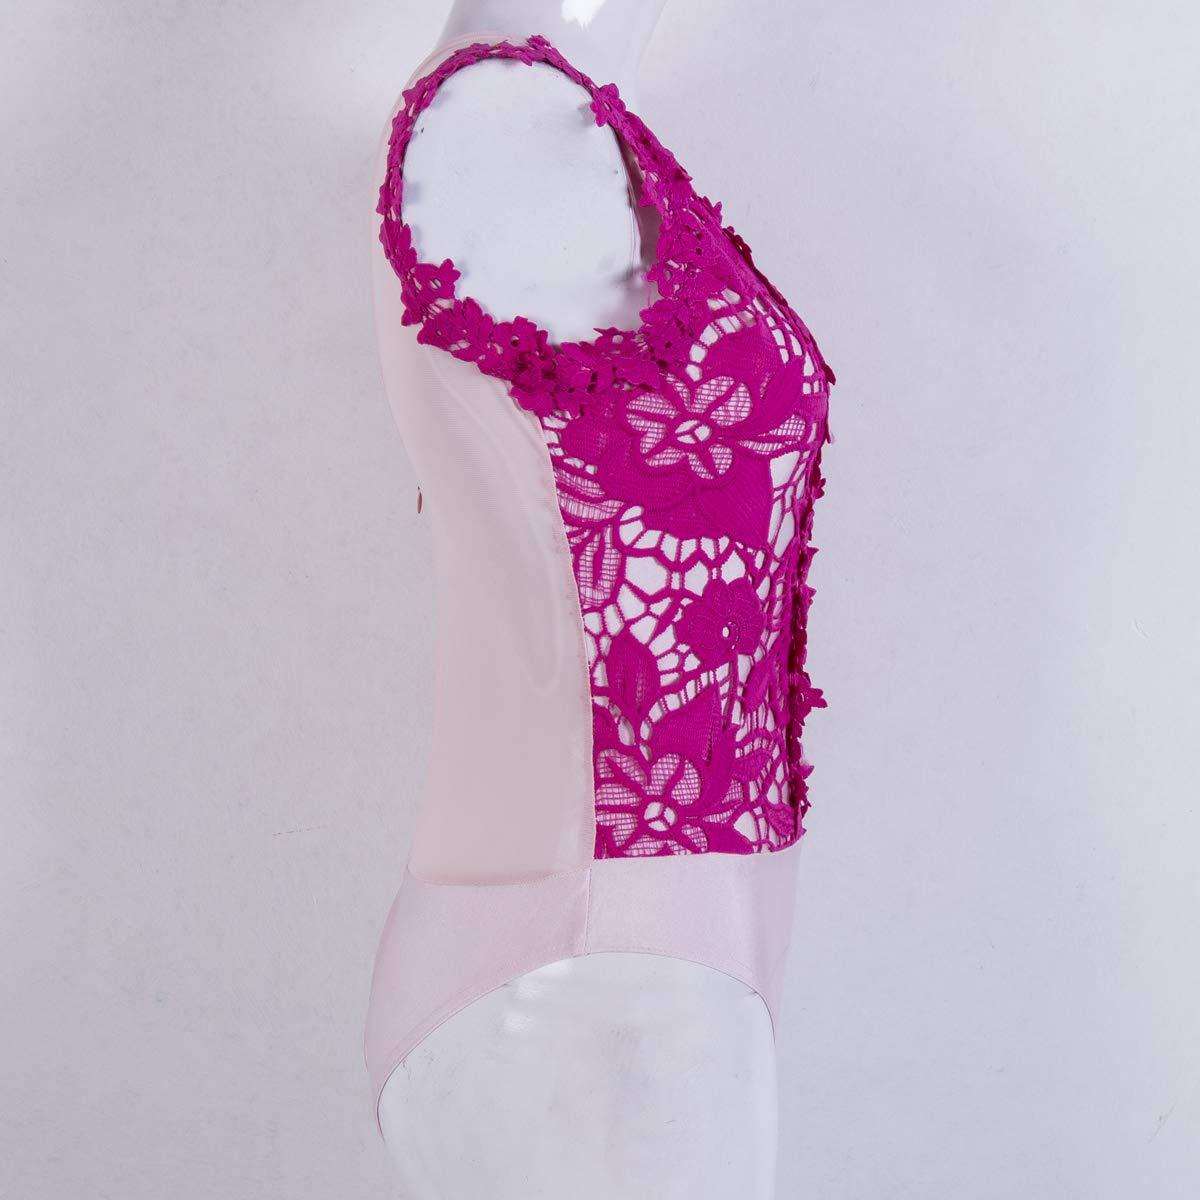 Small Size Loralie Damen Chic Spitze Bodysuit V-Ausschnitt Bodys Overall /Ärmellos Tops R/ückenfrei Oberteil